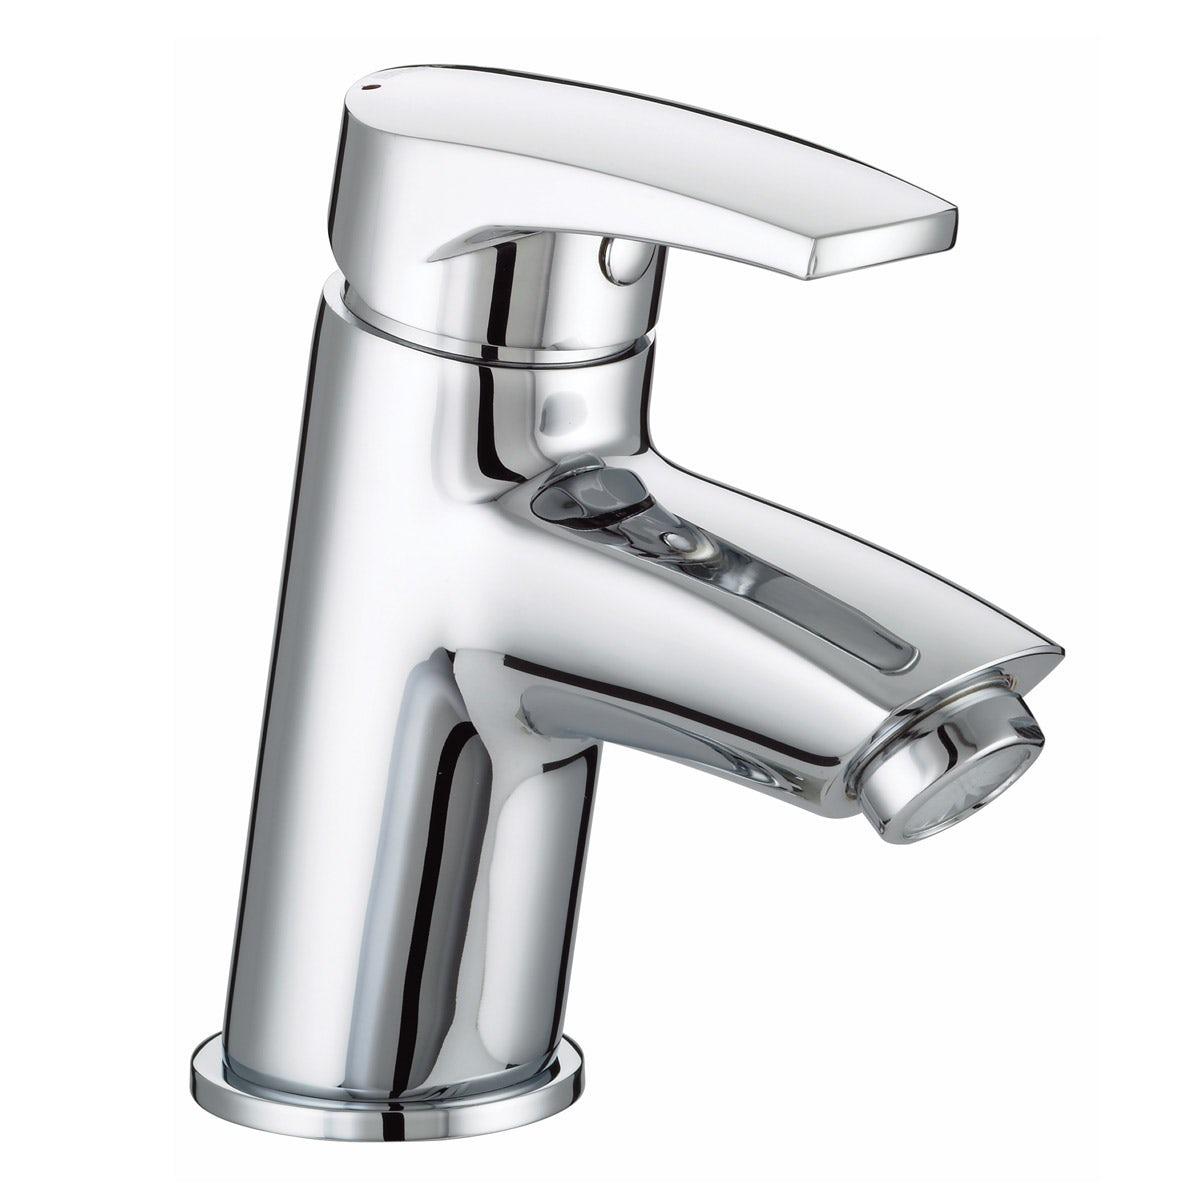 Bristan Orta basin mixer tap